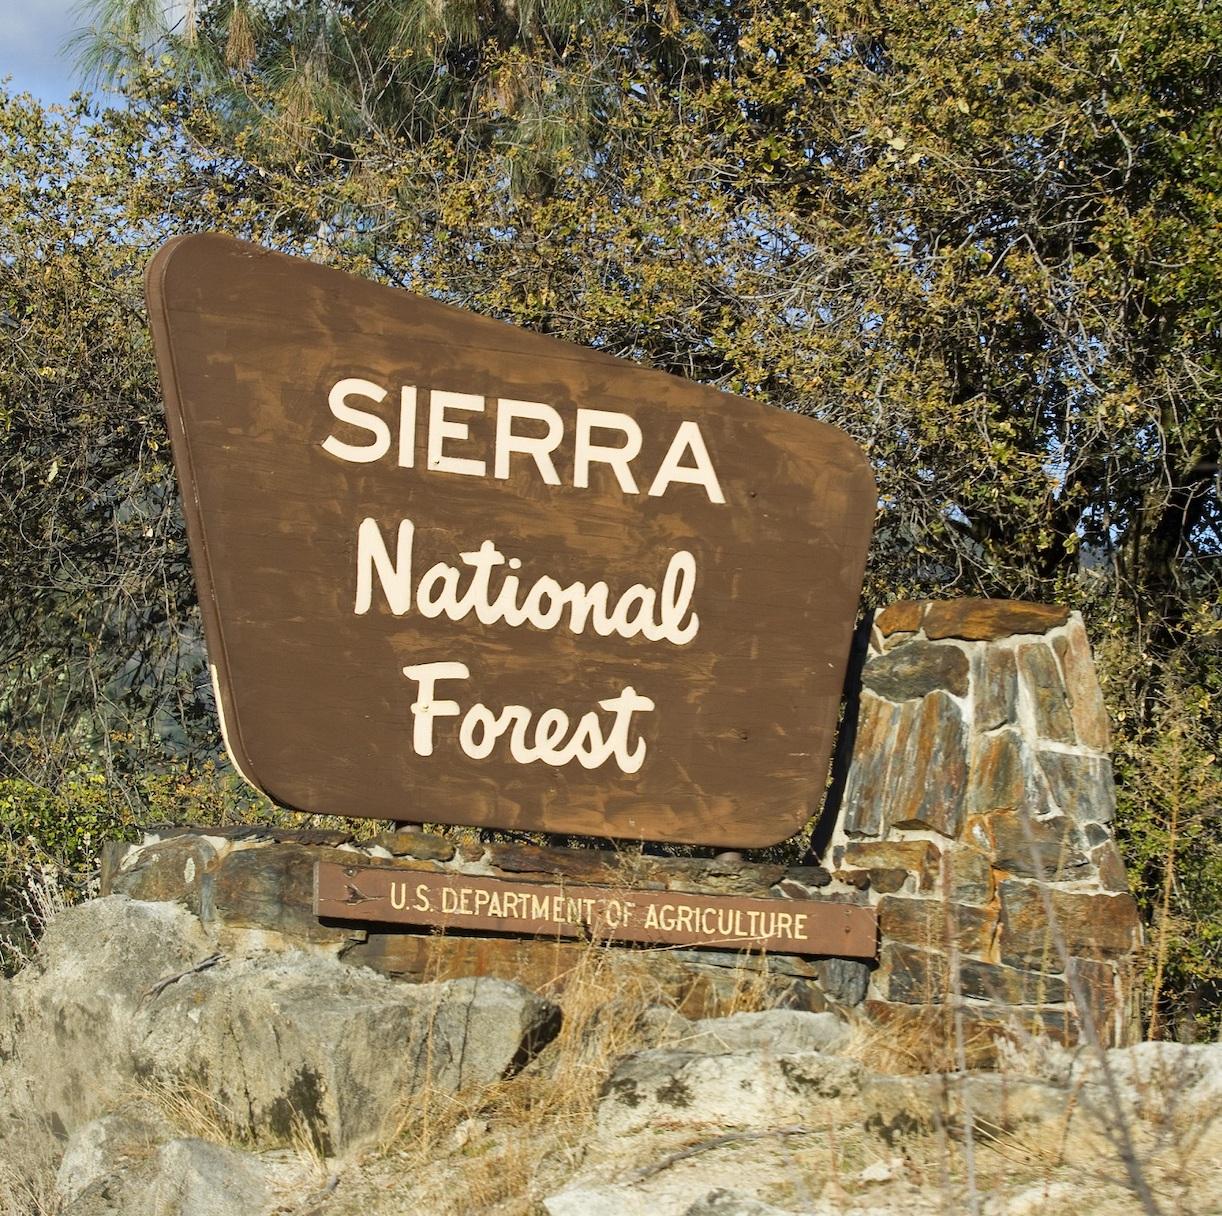 Sierra National Forest gerrish